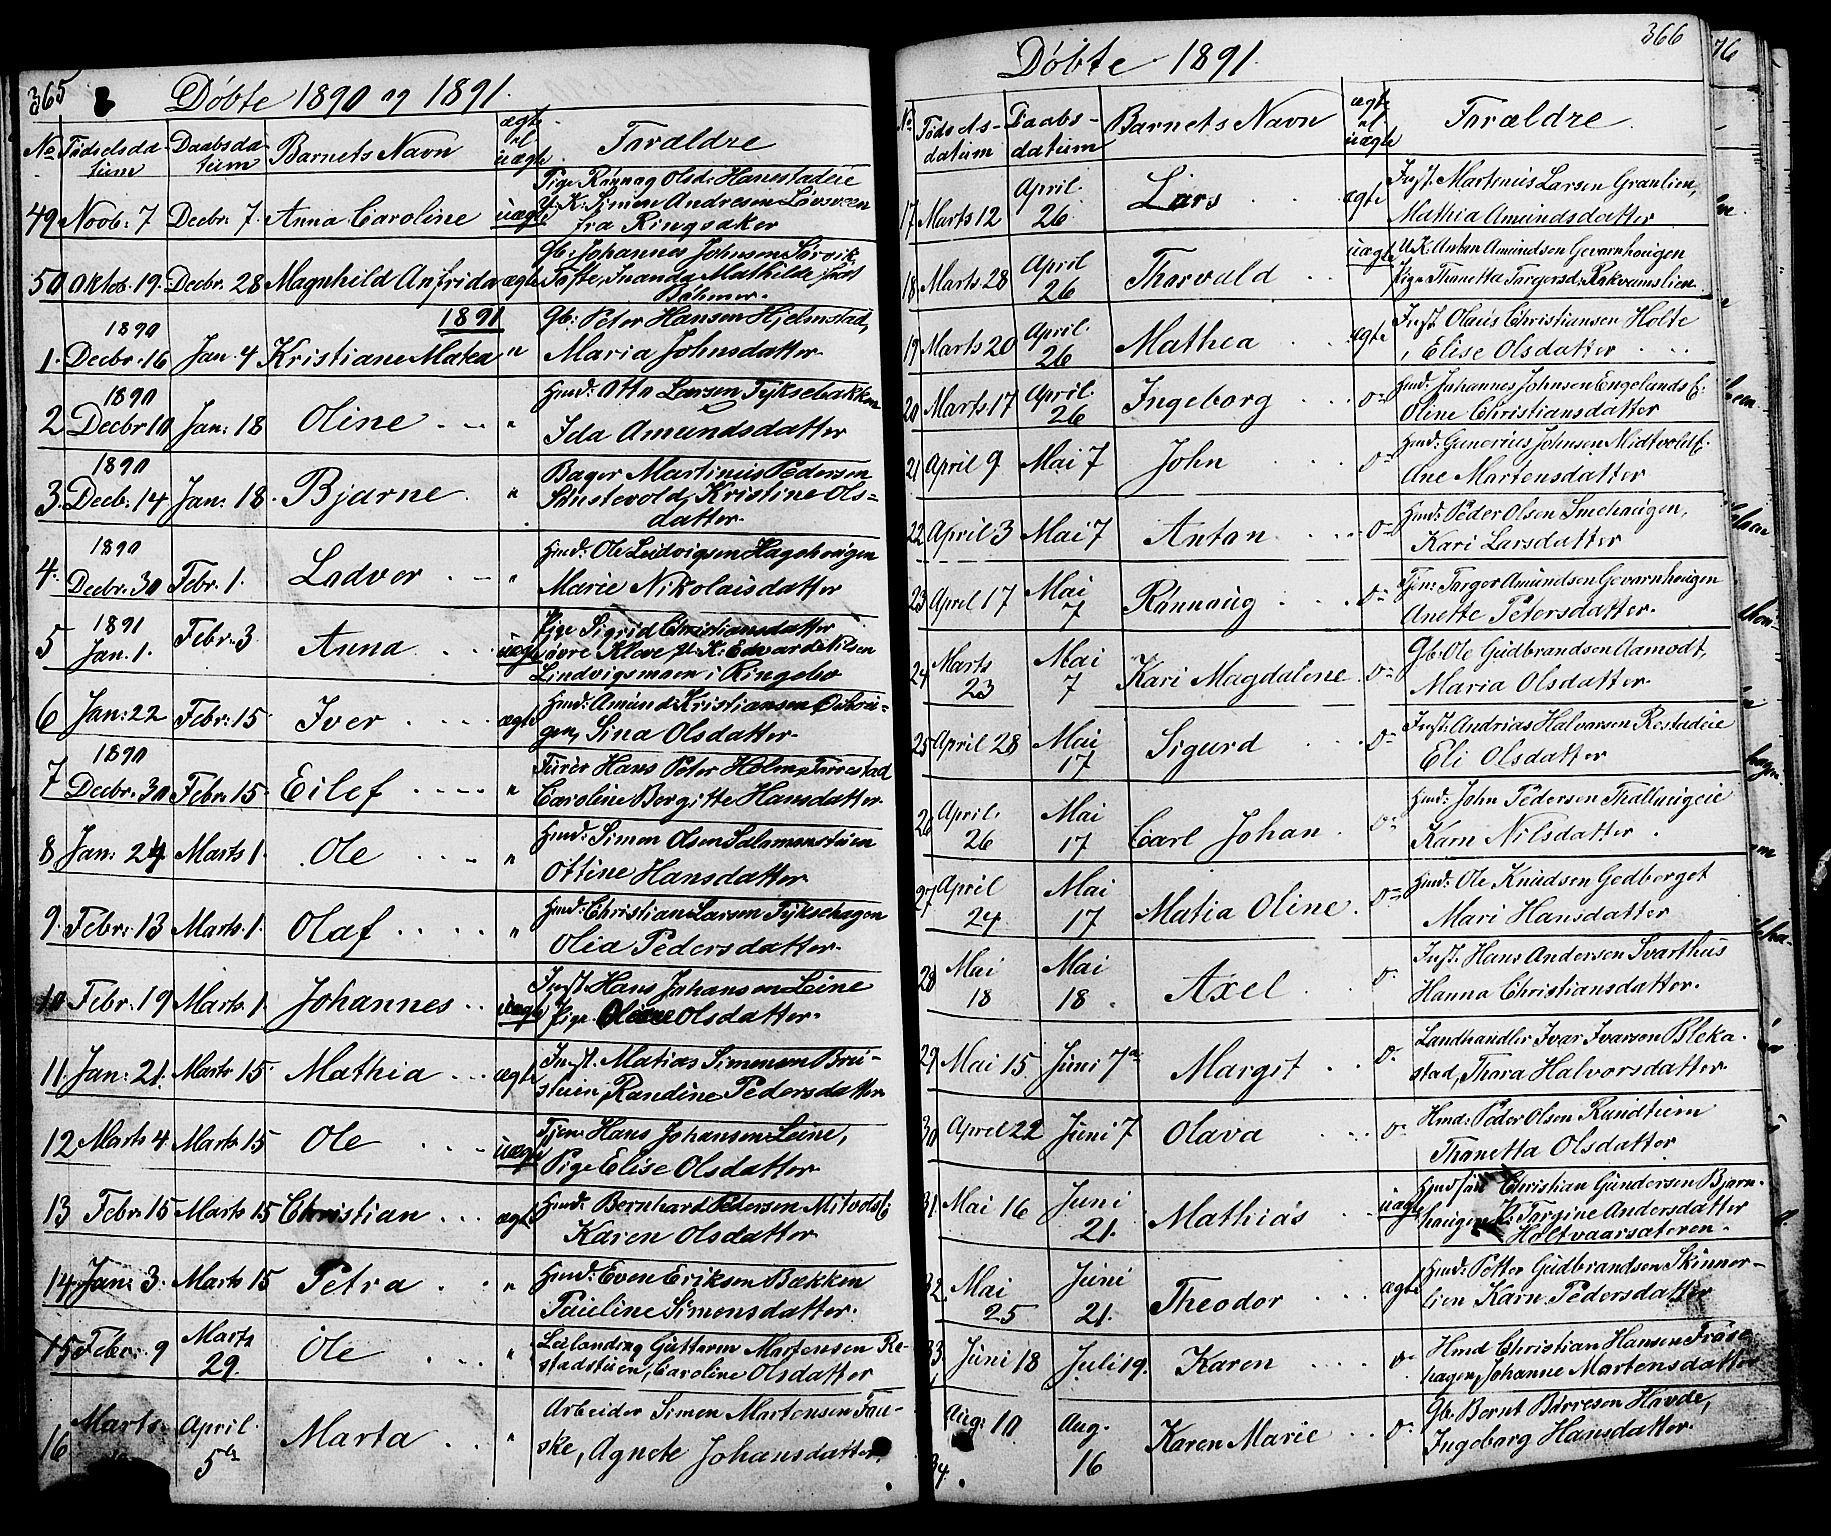 SAH, Østre Gausdal prestekontor, Klokkerbok nr. 1, 1863-1893, s. 365-366